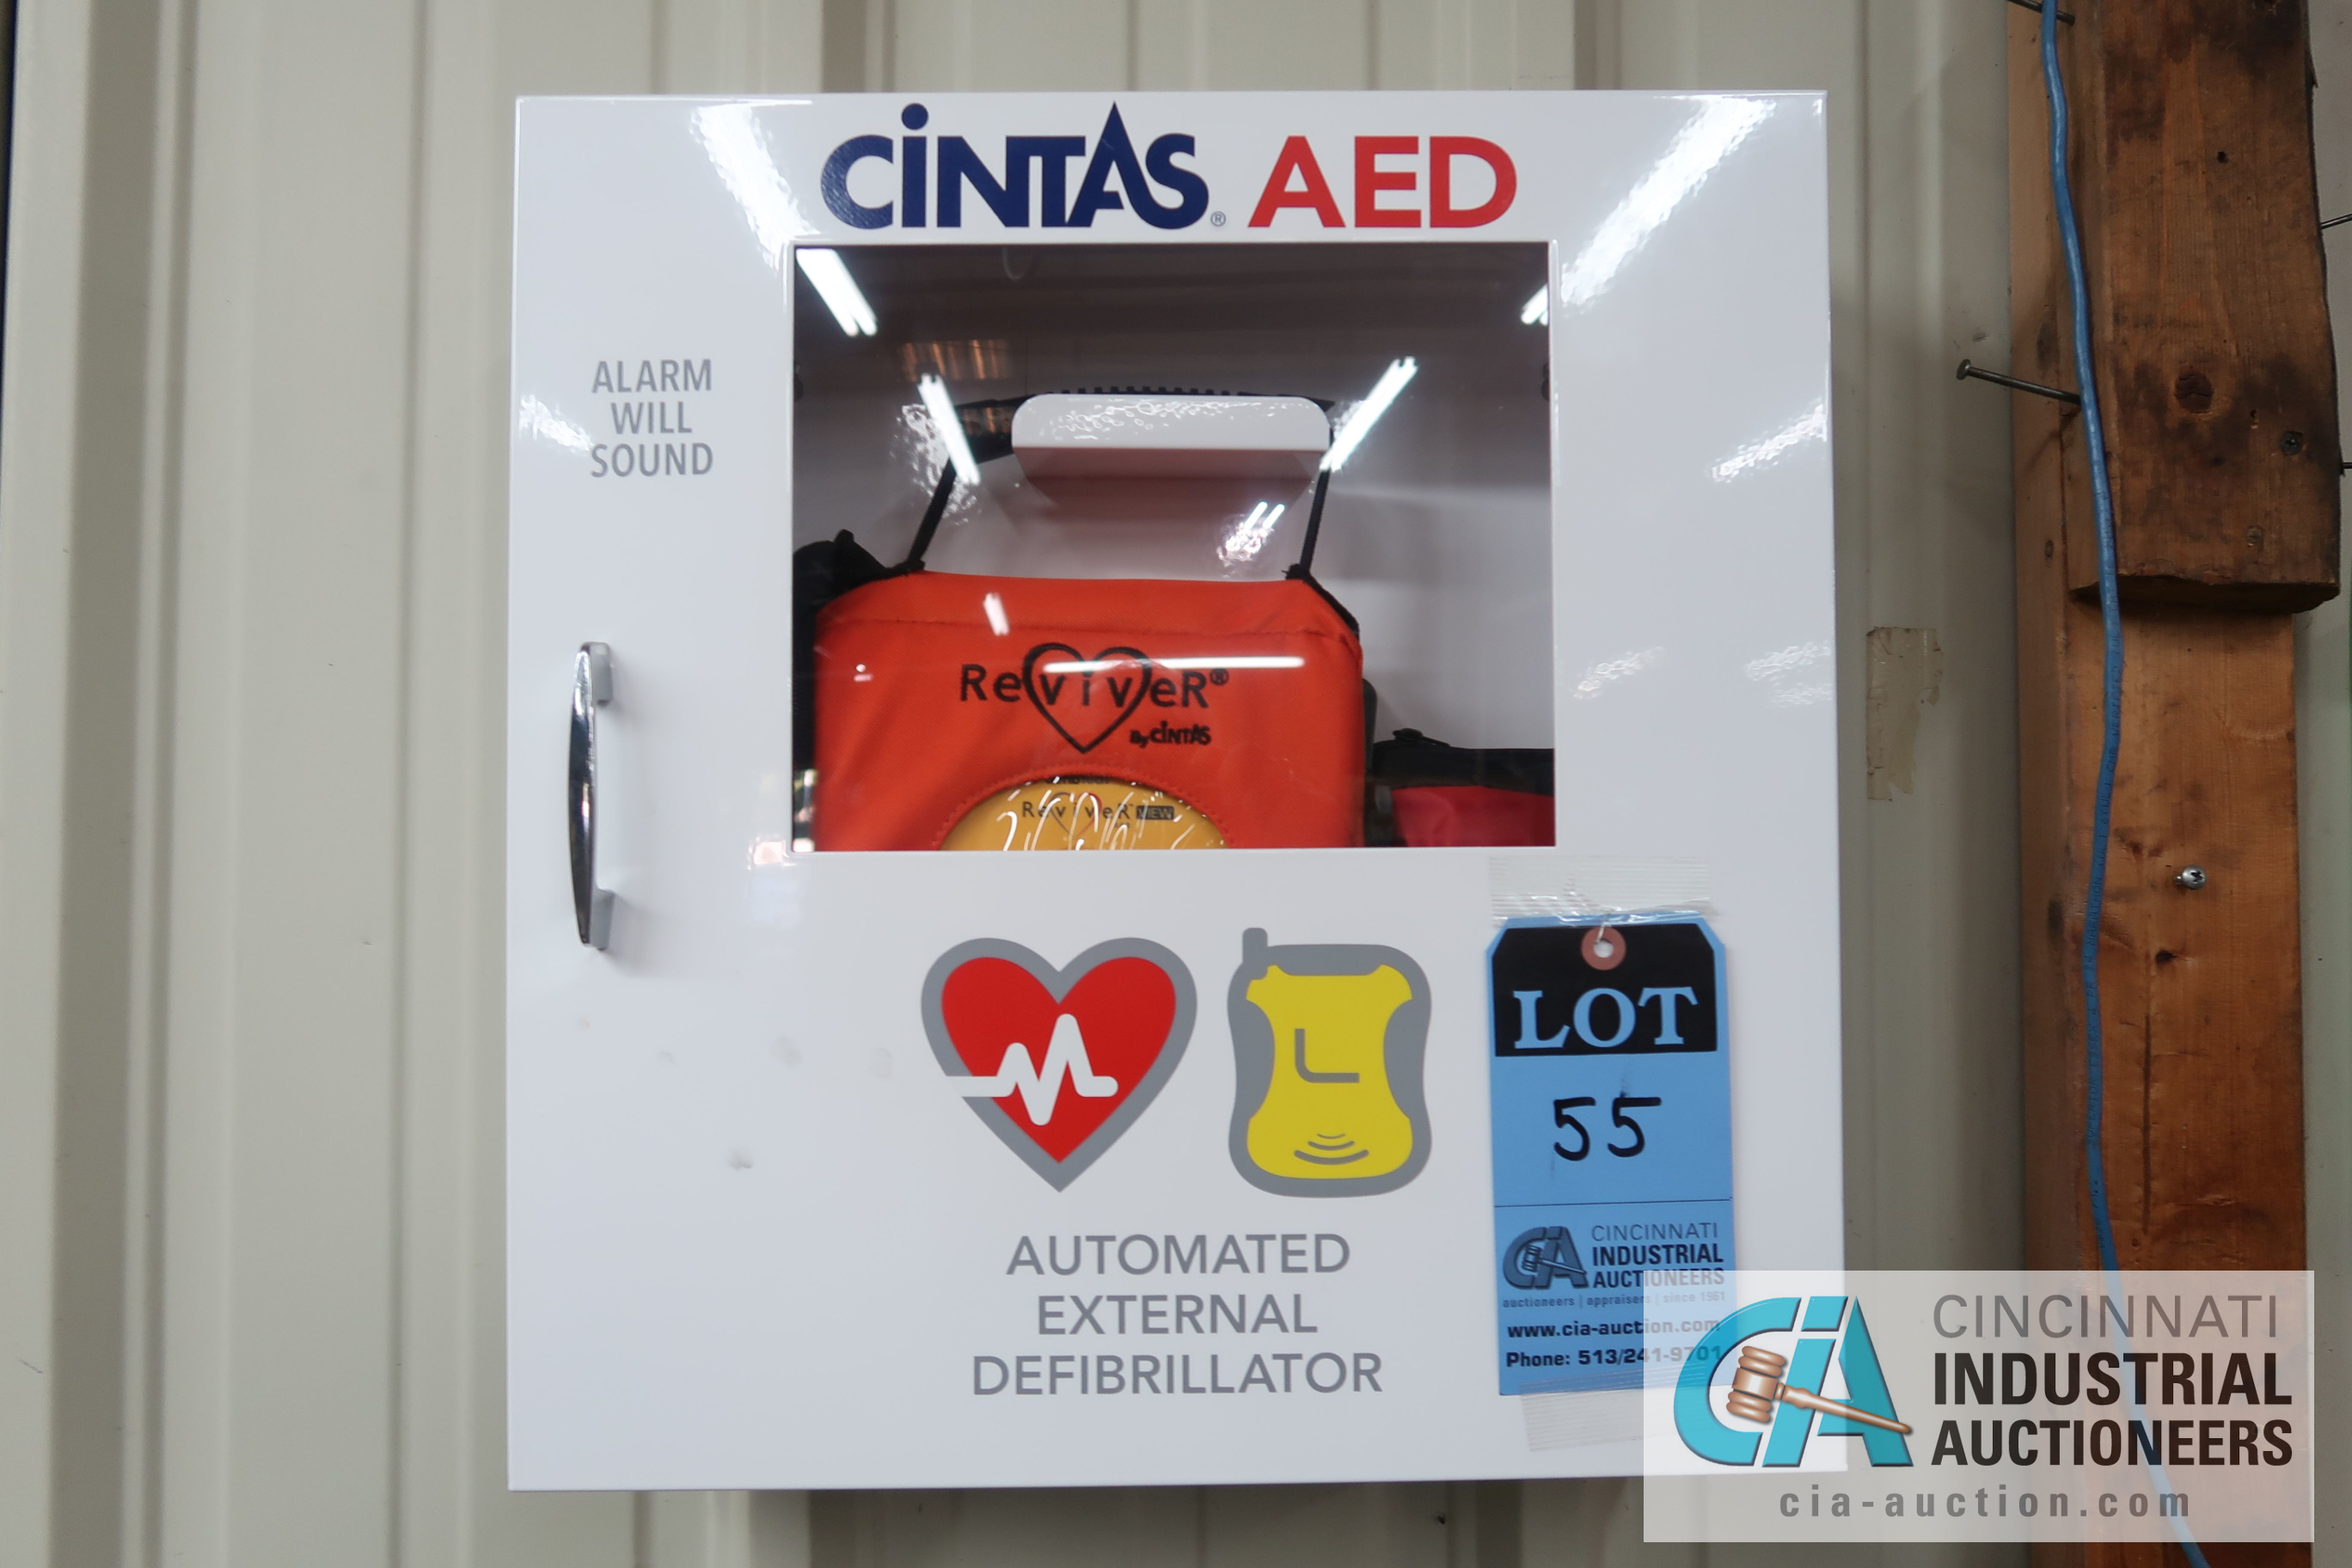 CINTAS AUTOMATED EXTERNAL DEFIBRILLATOR